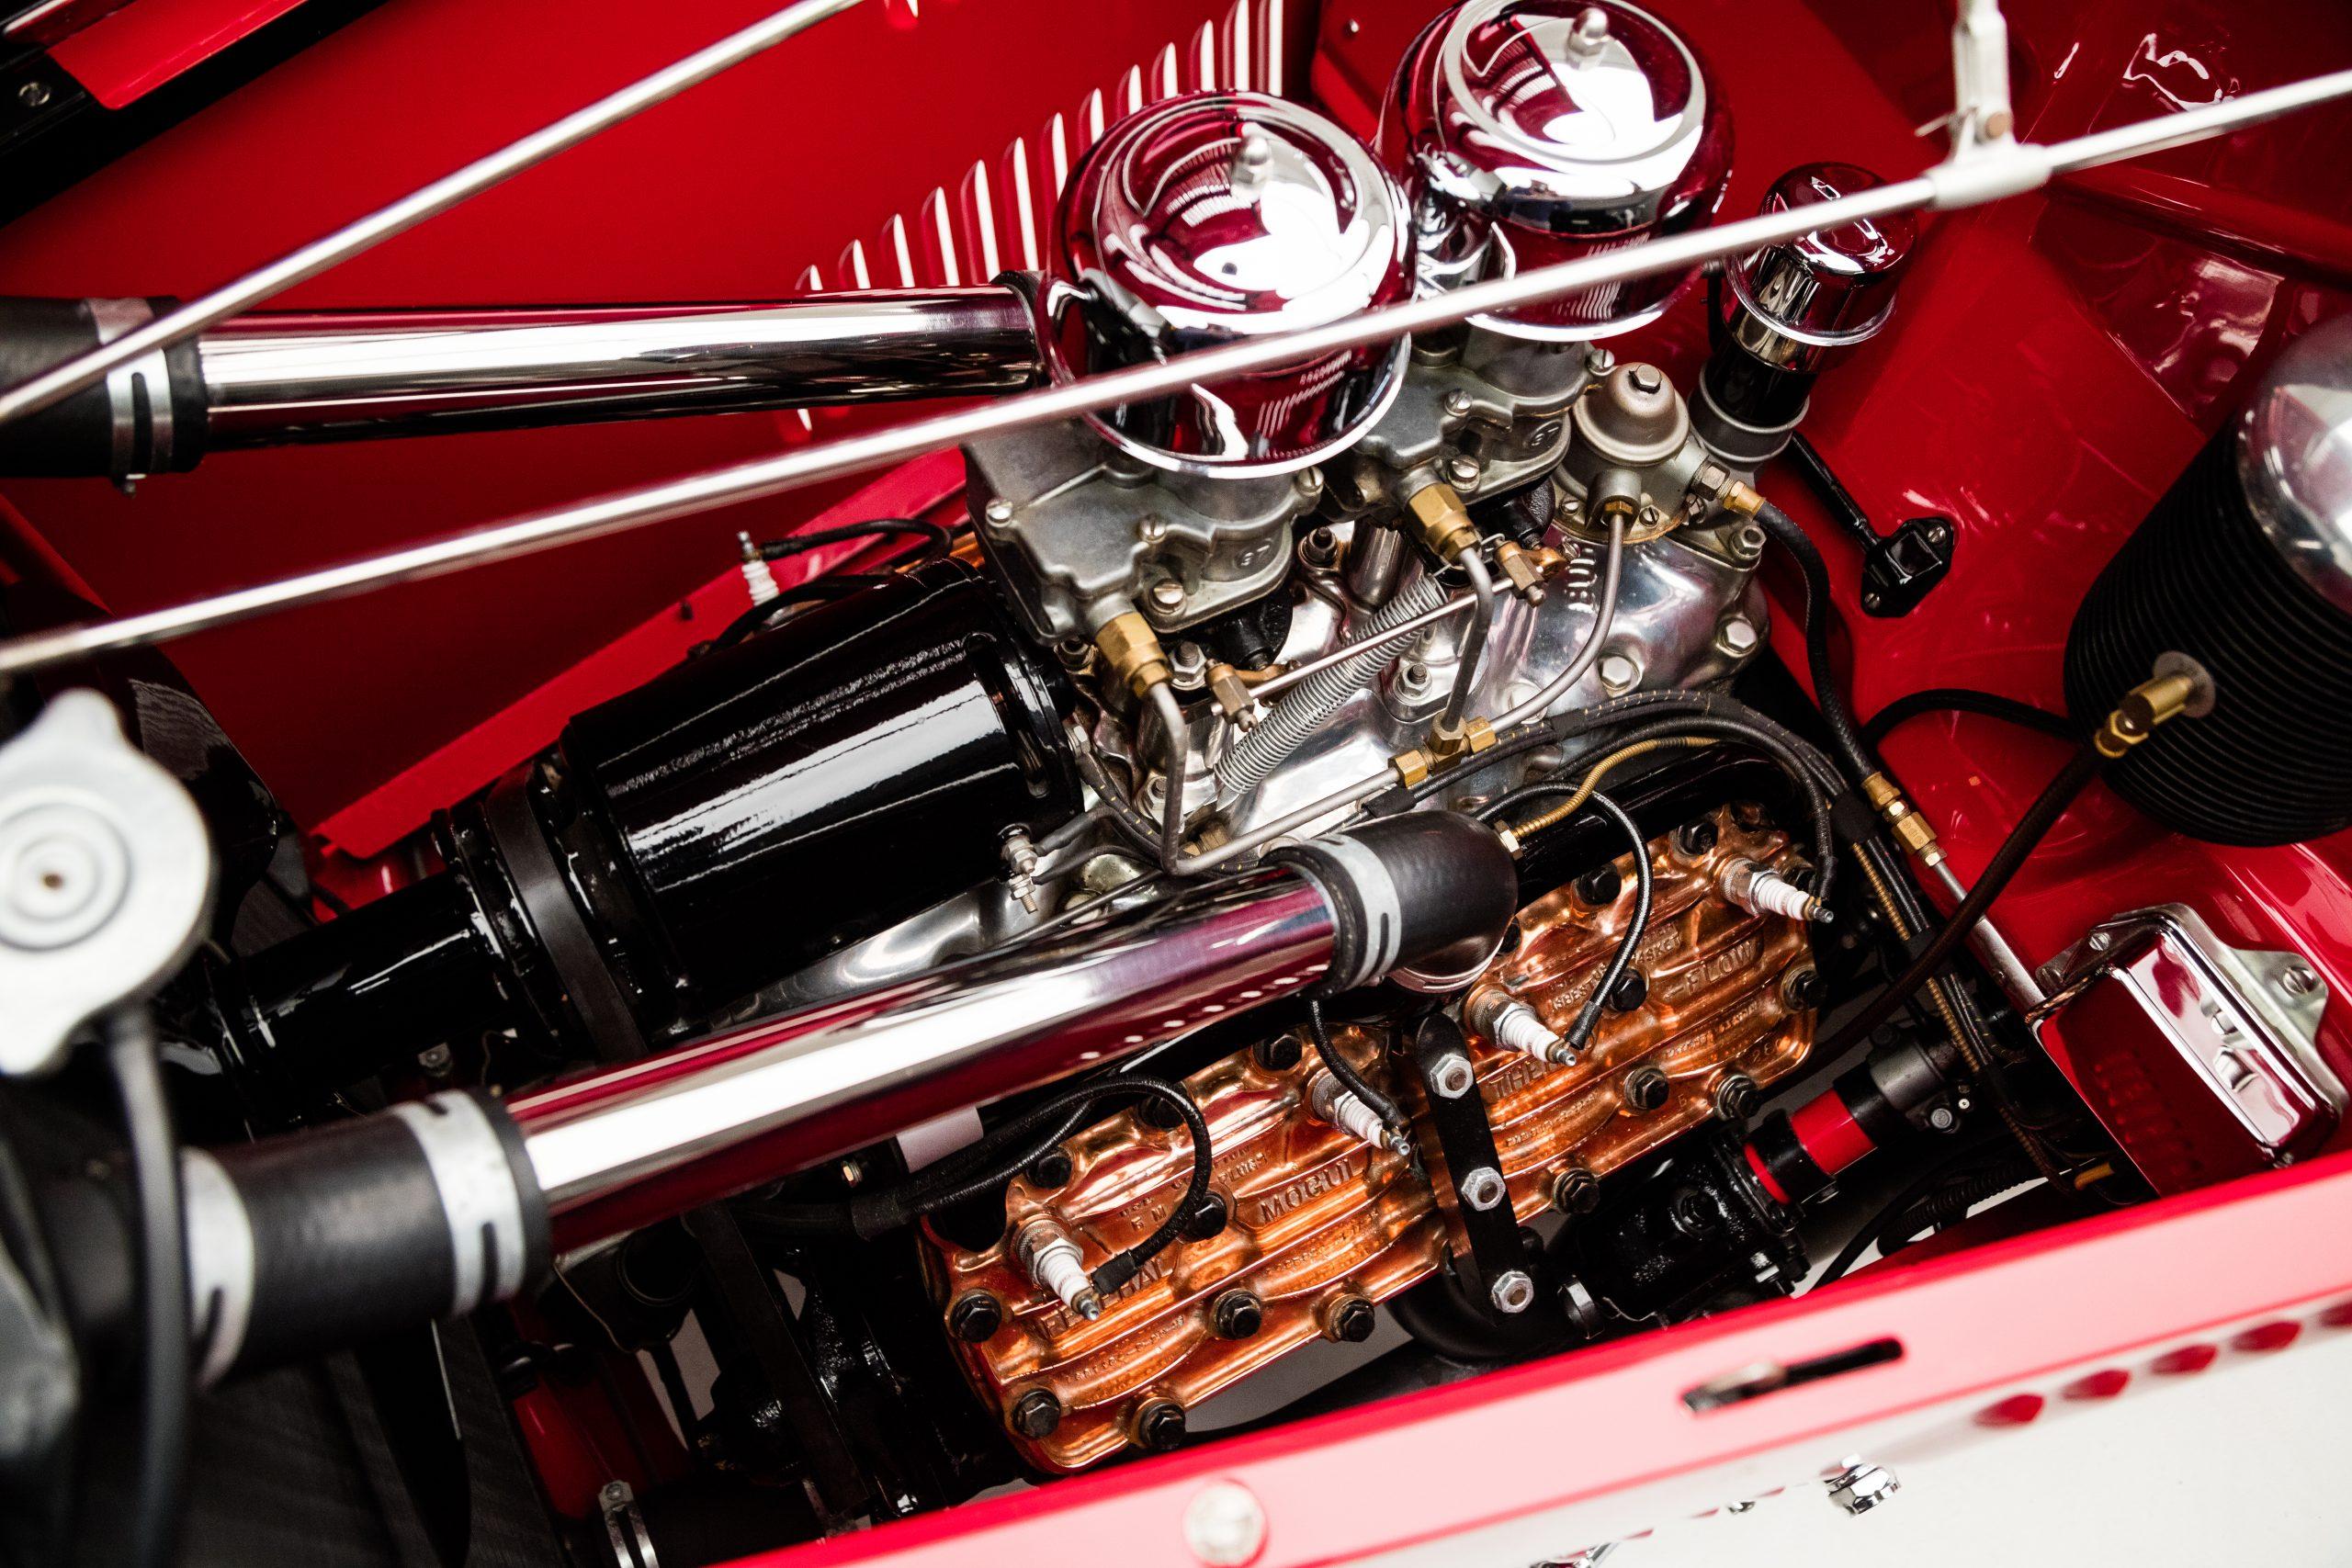 McGee Roadster - 1932 Ford - HVA - Studio 5 engine